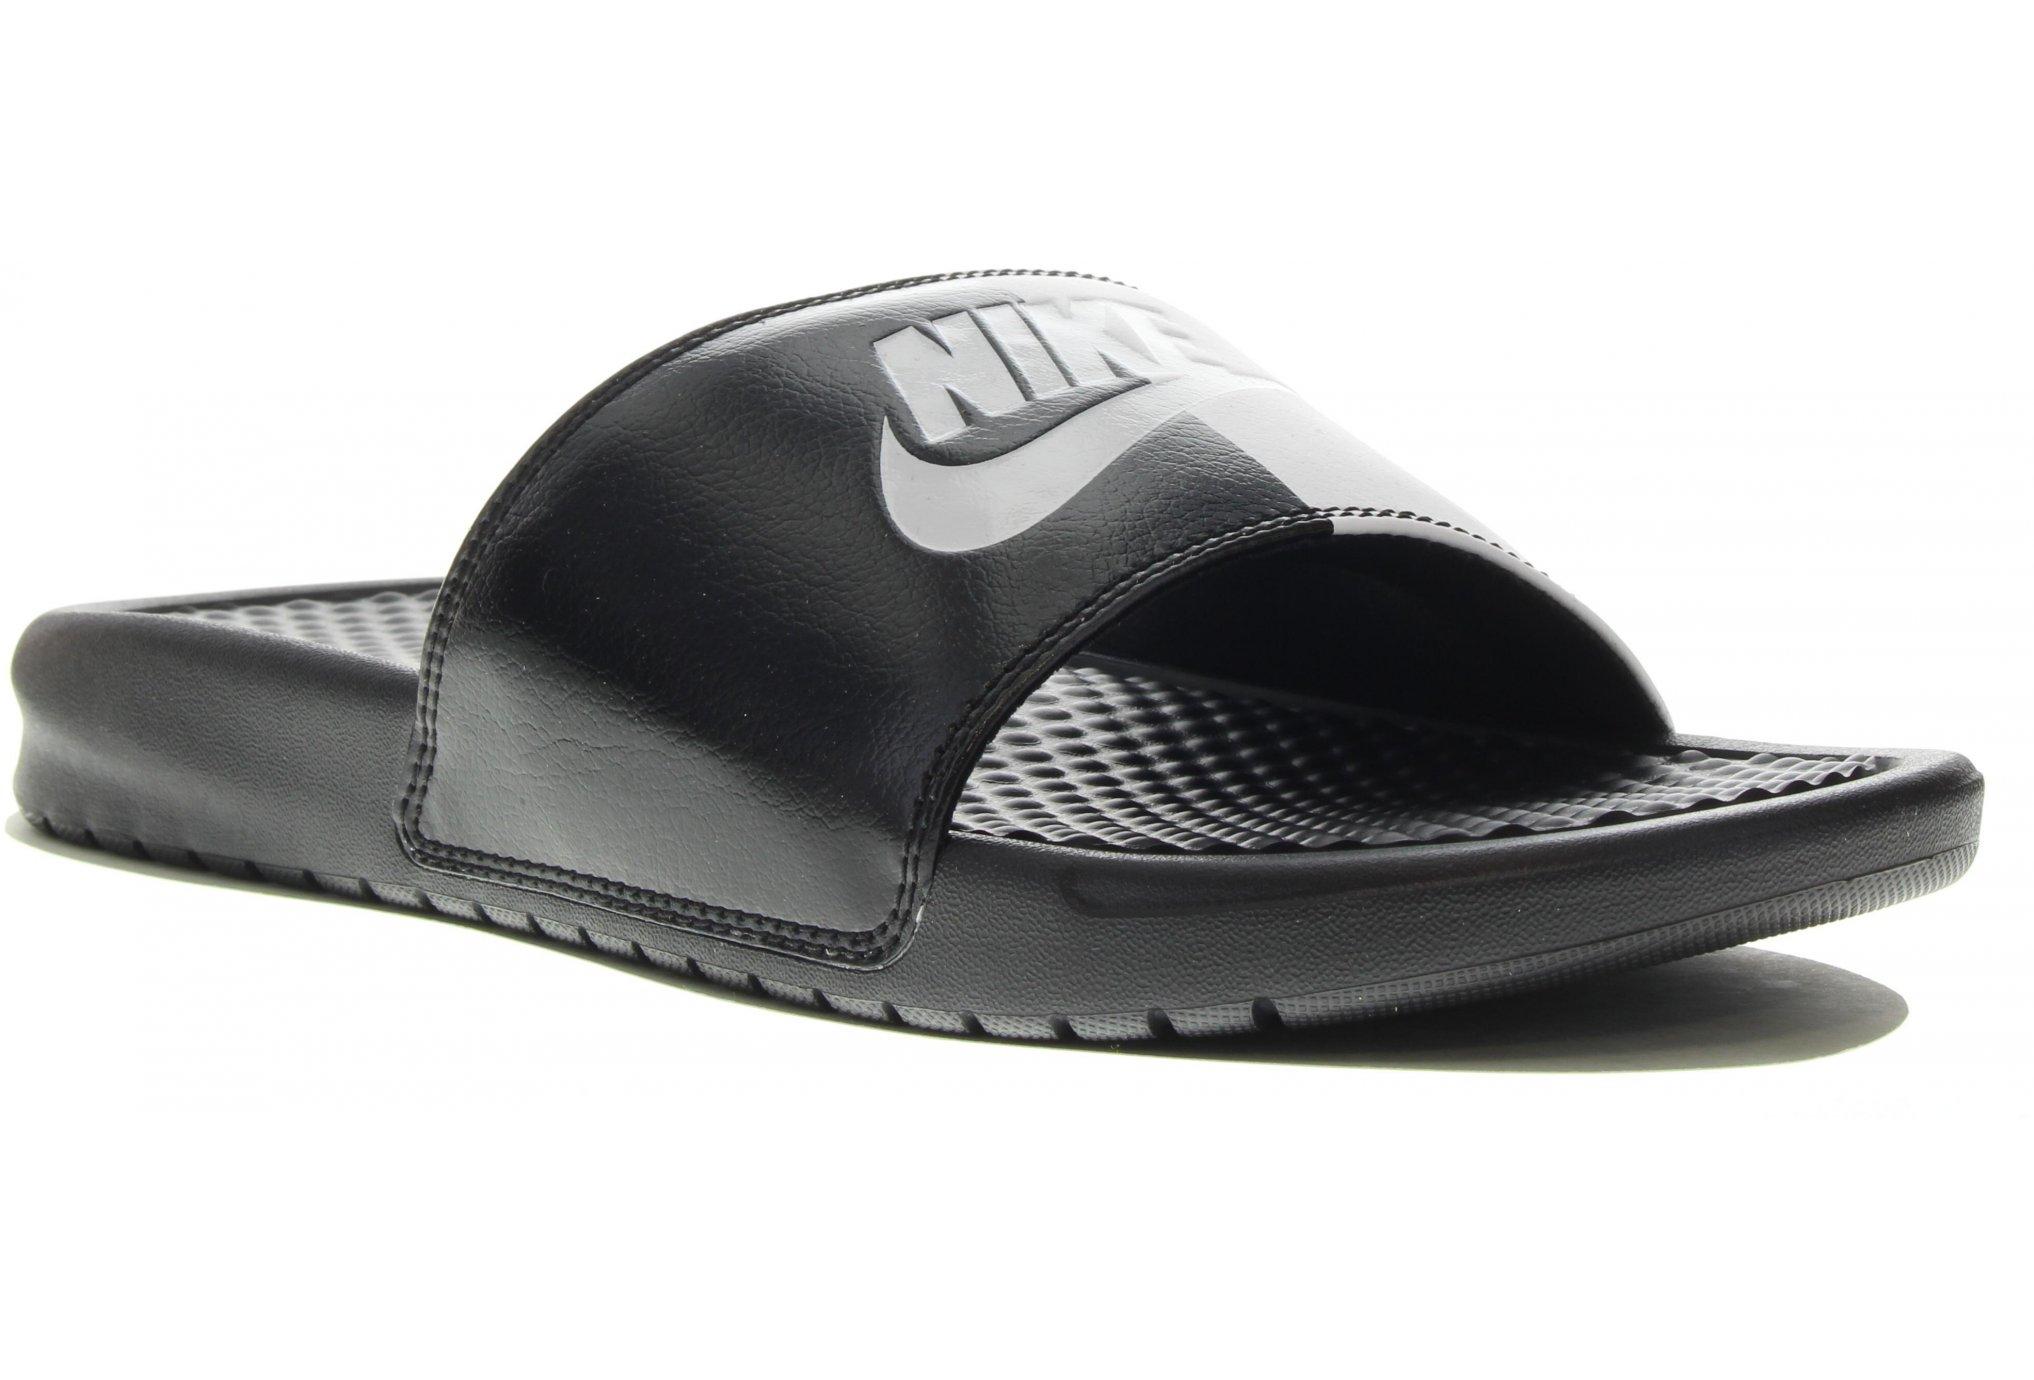 wholesale dealer 50fe2 19308 Nike Benassi JDI M Chaussures homme